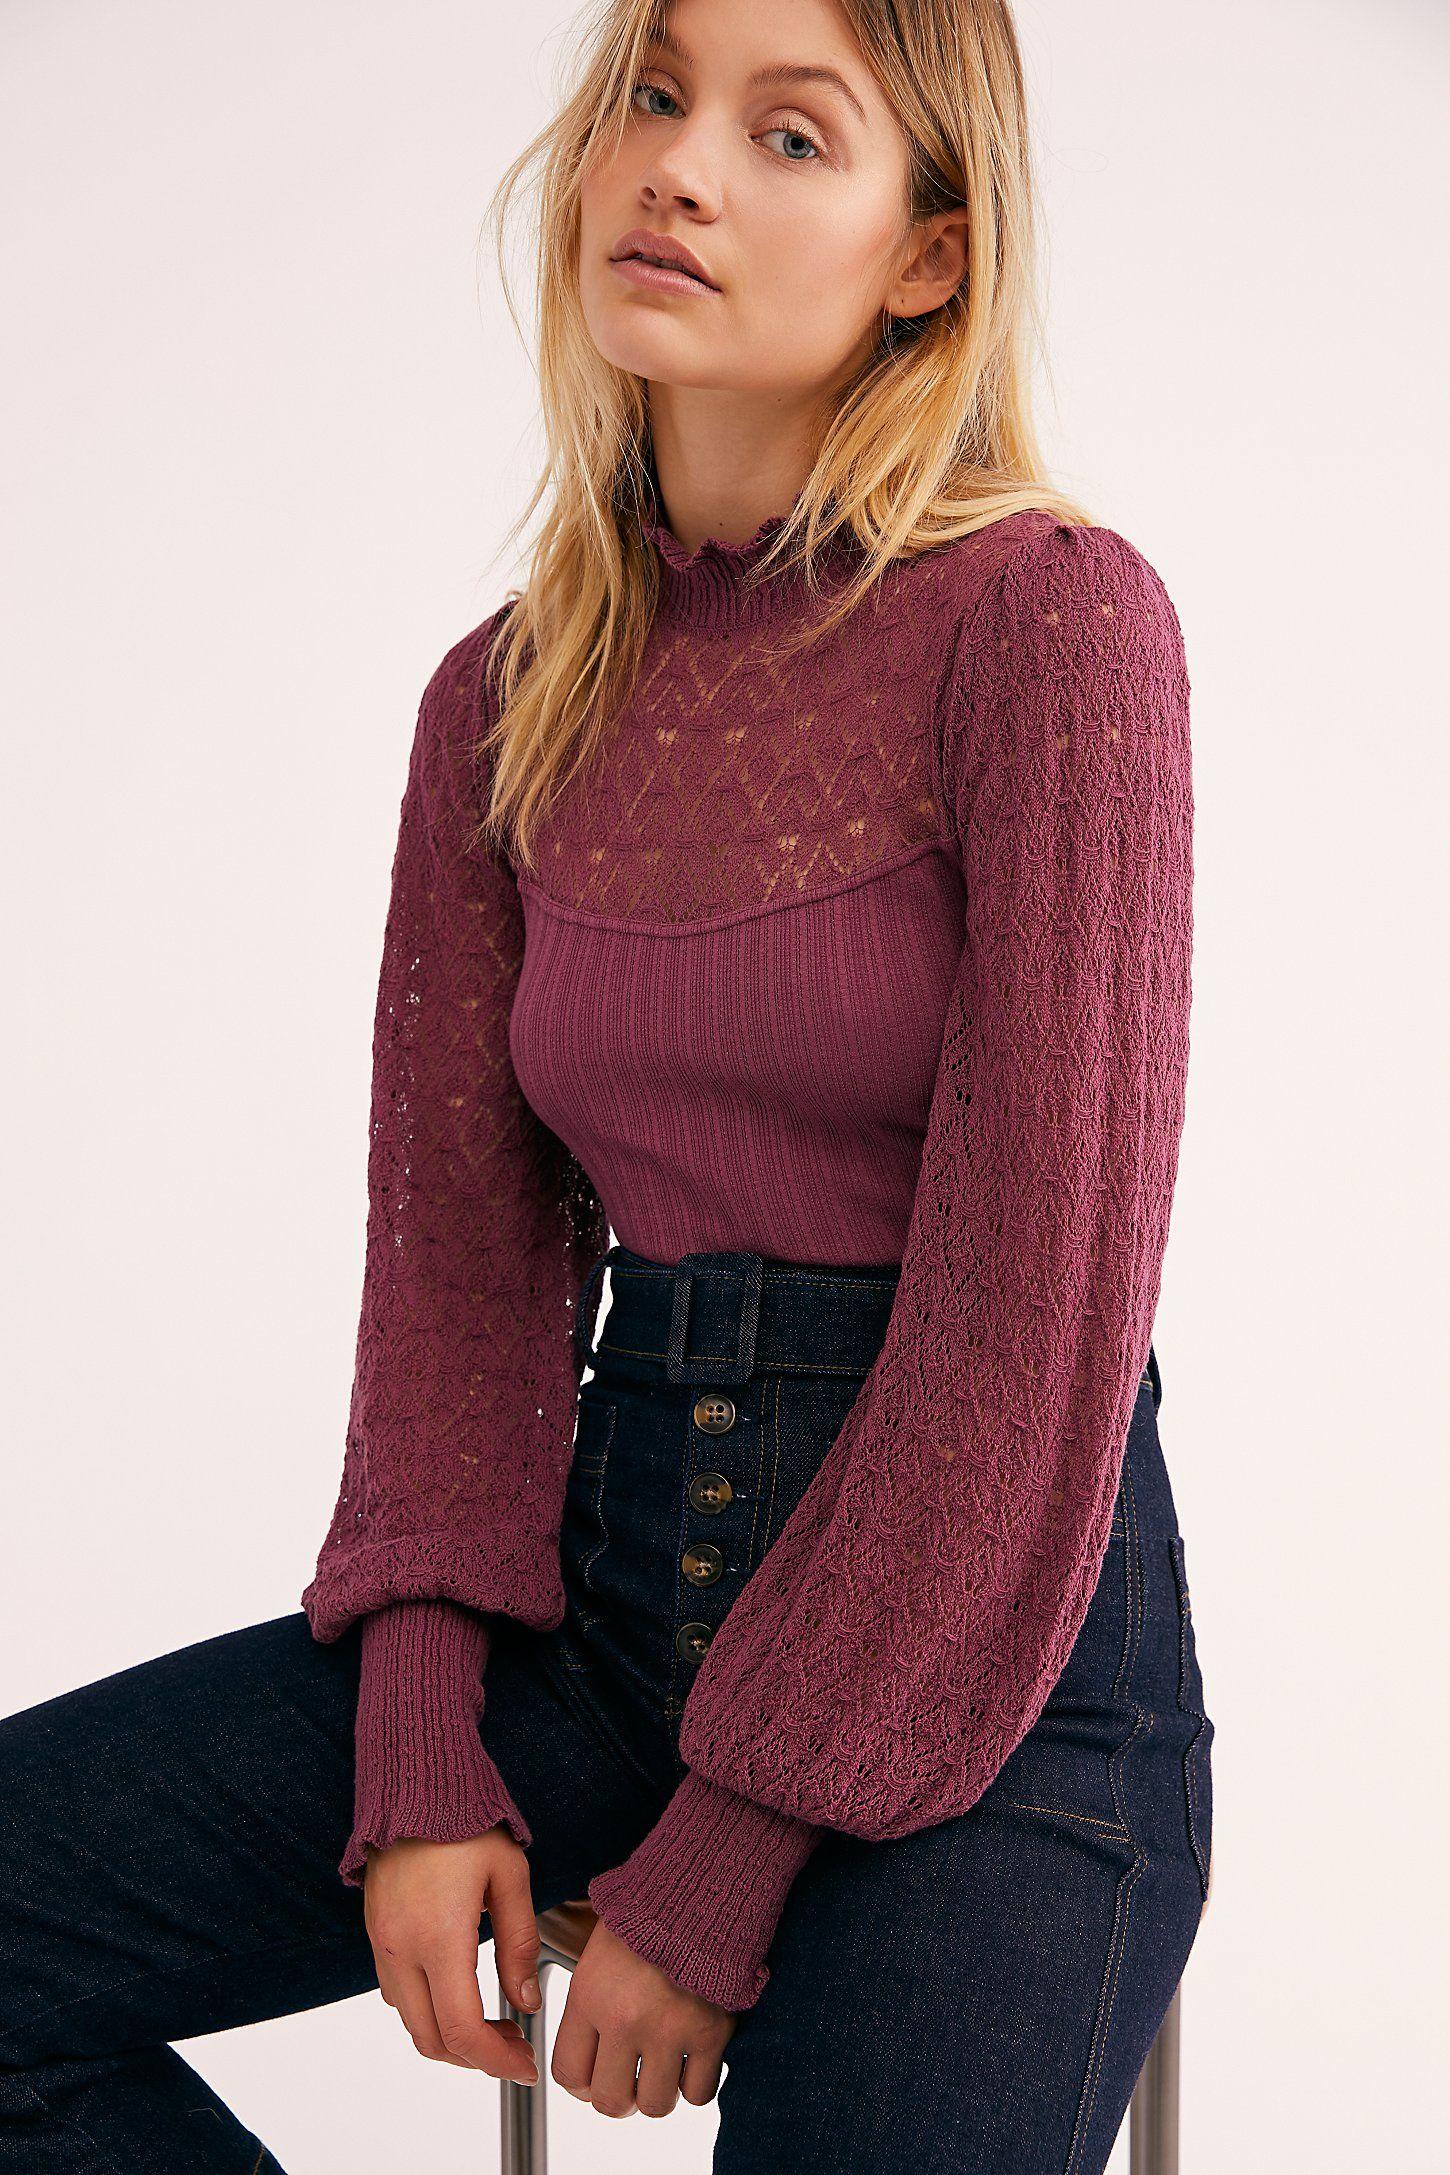 Alpine Swit Top Winter outfits women, Fashion, Sweaters